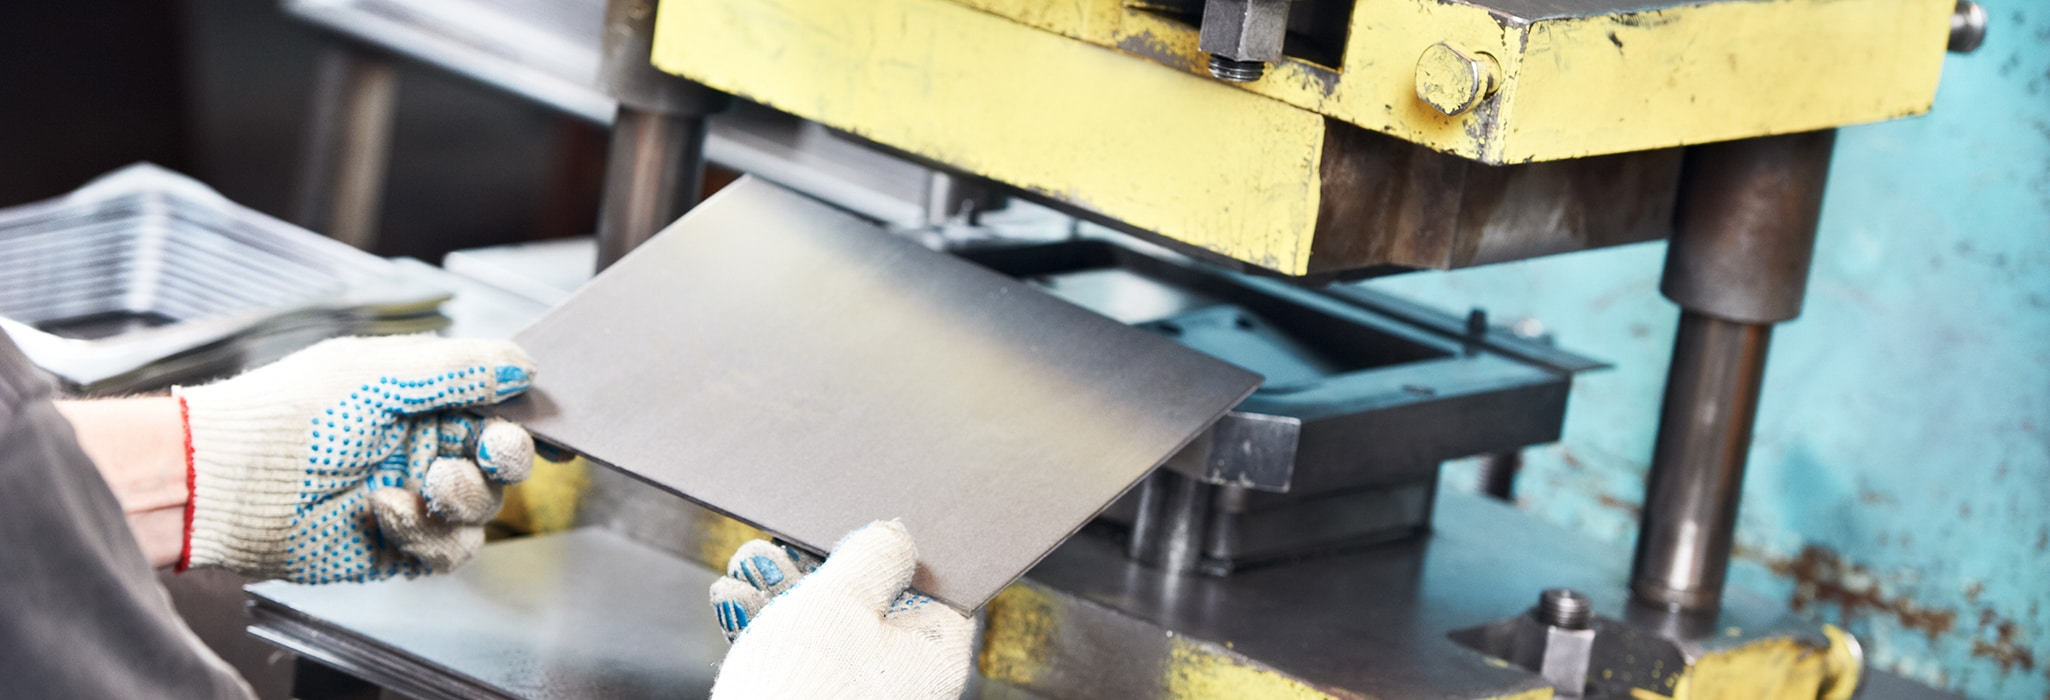 custom metal fabrication.